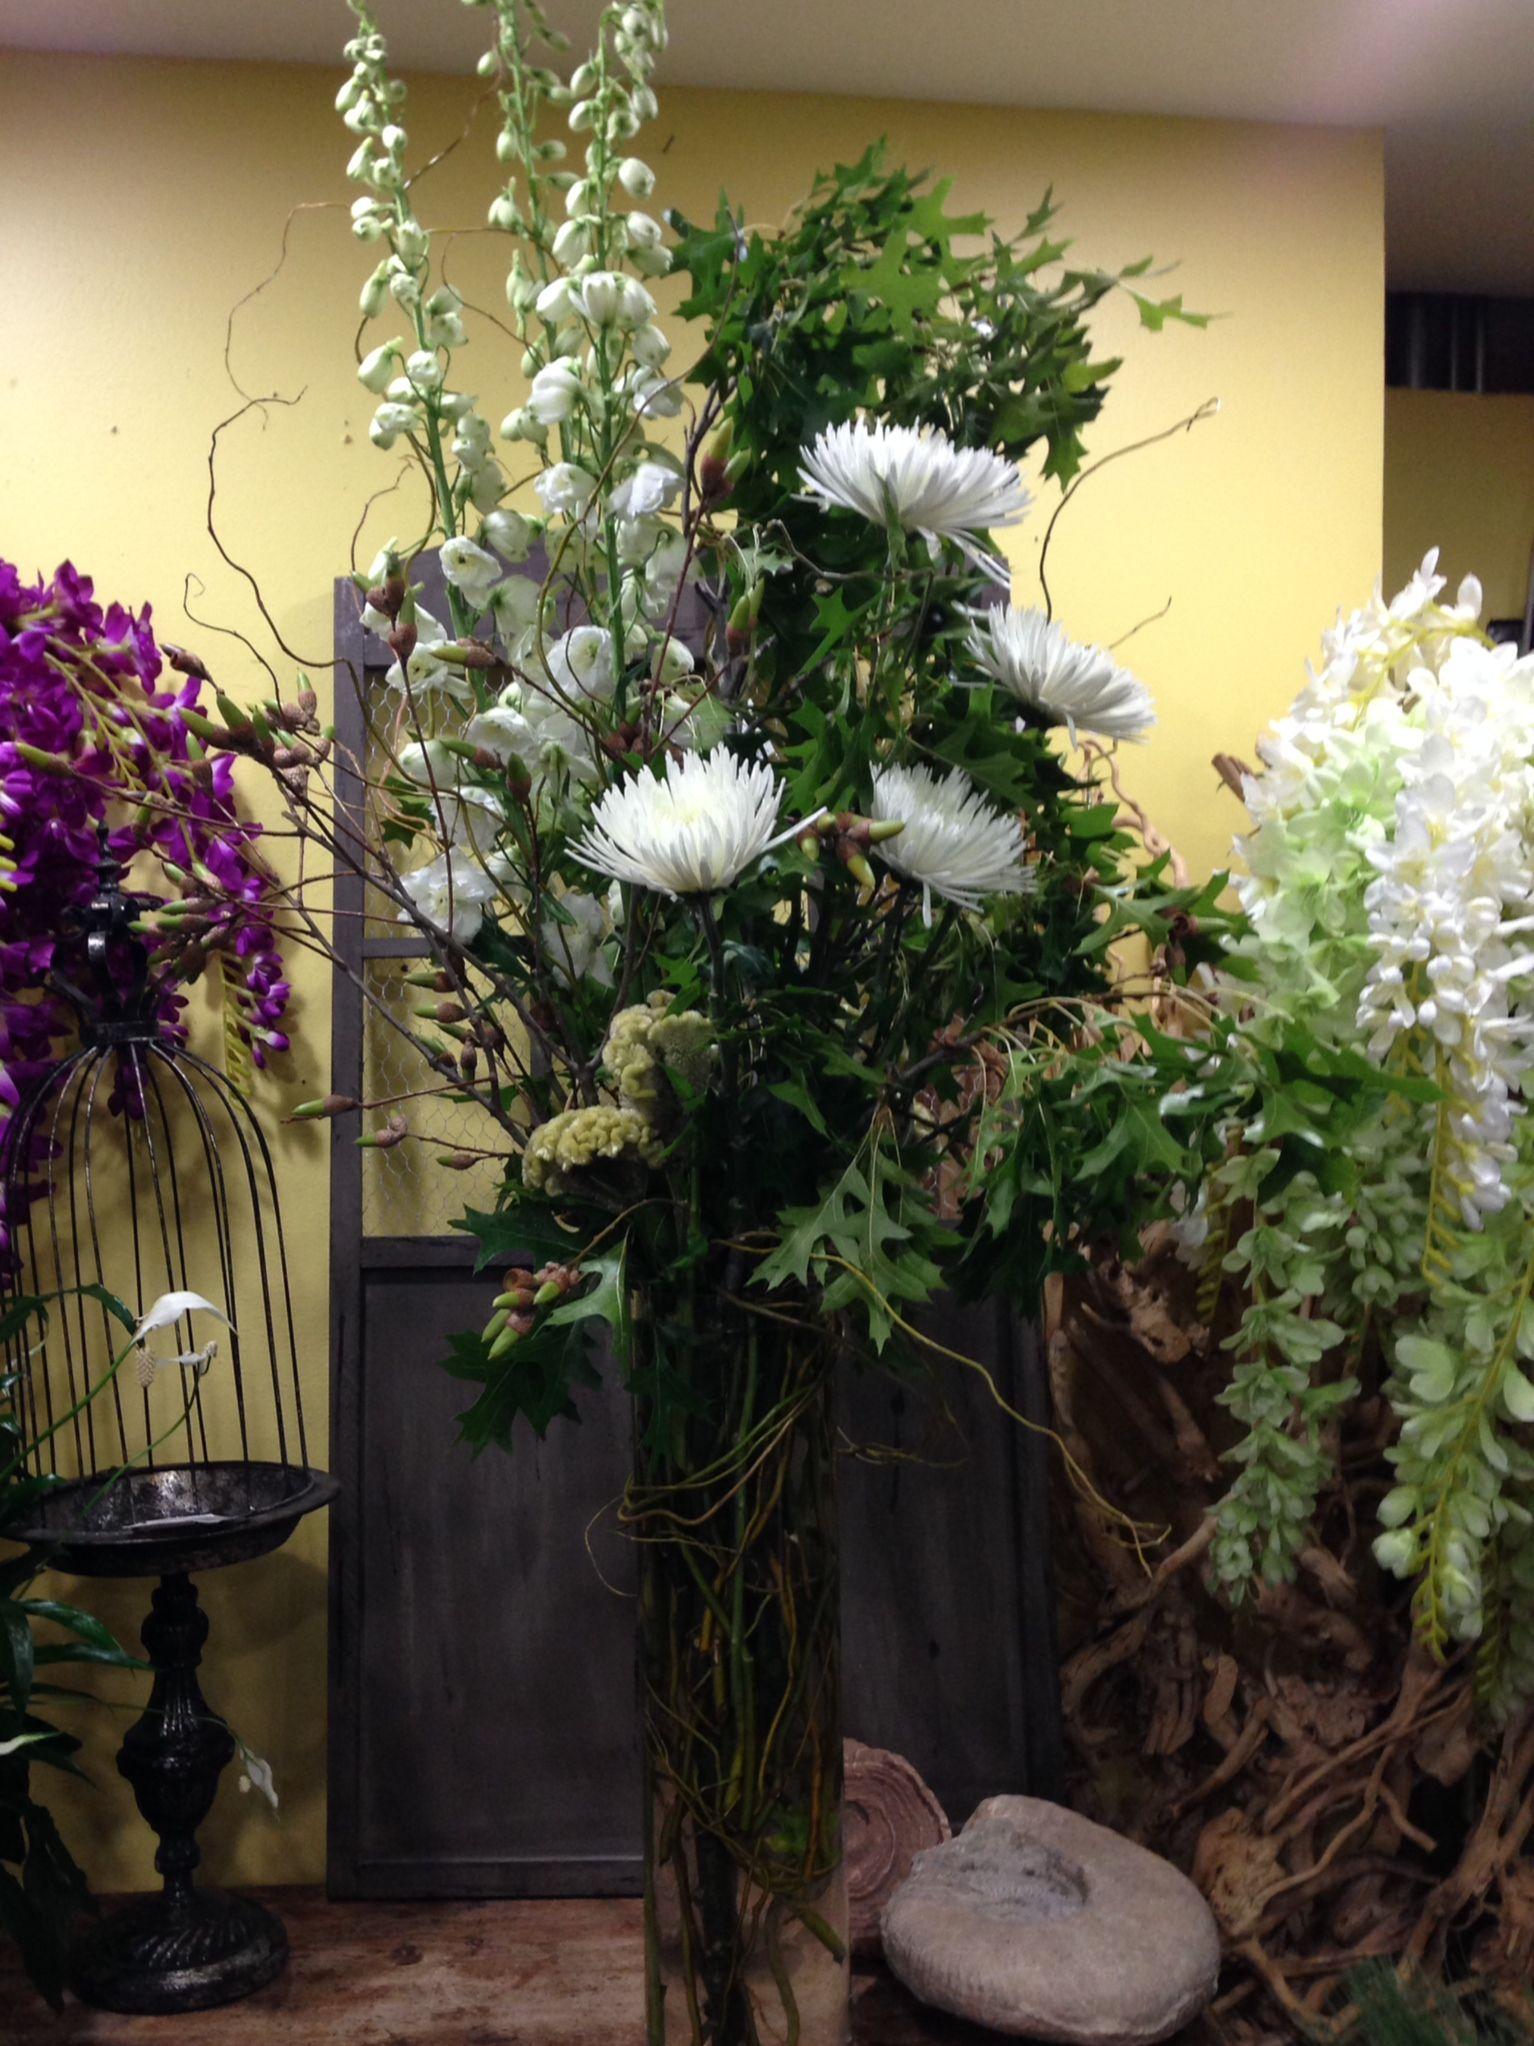 The Virgin Forest- White Hybrid Delphinium, Green Celosia, Artichoke, Branches, Acorn, Curly Willow